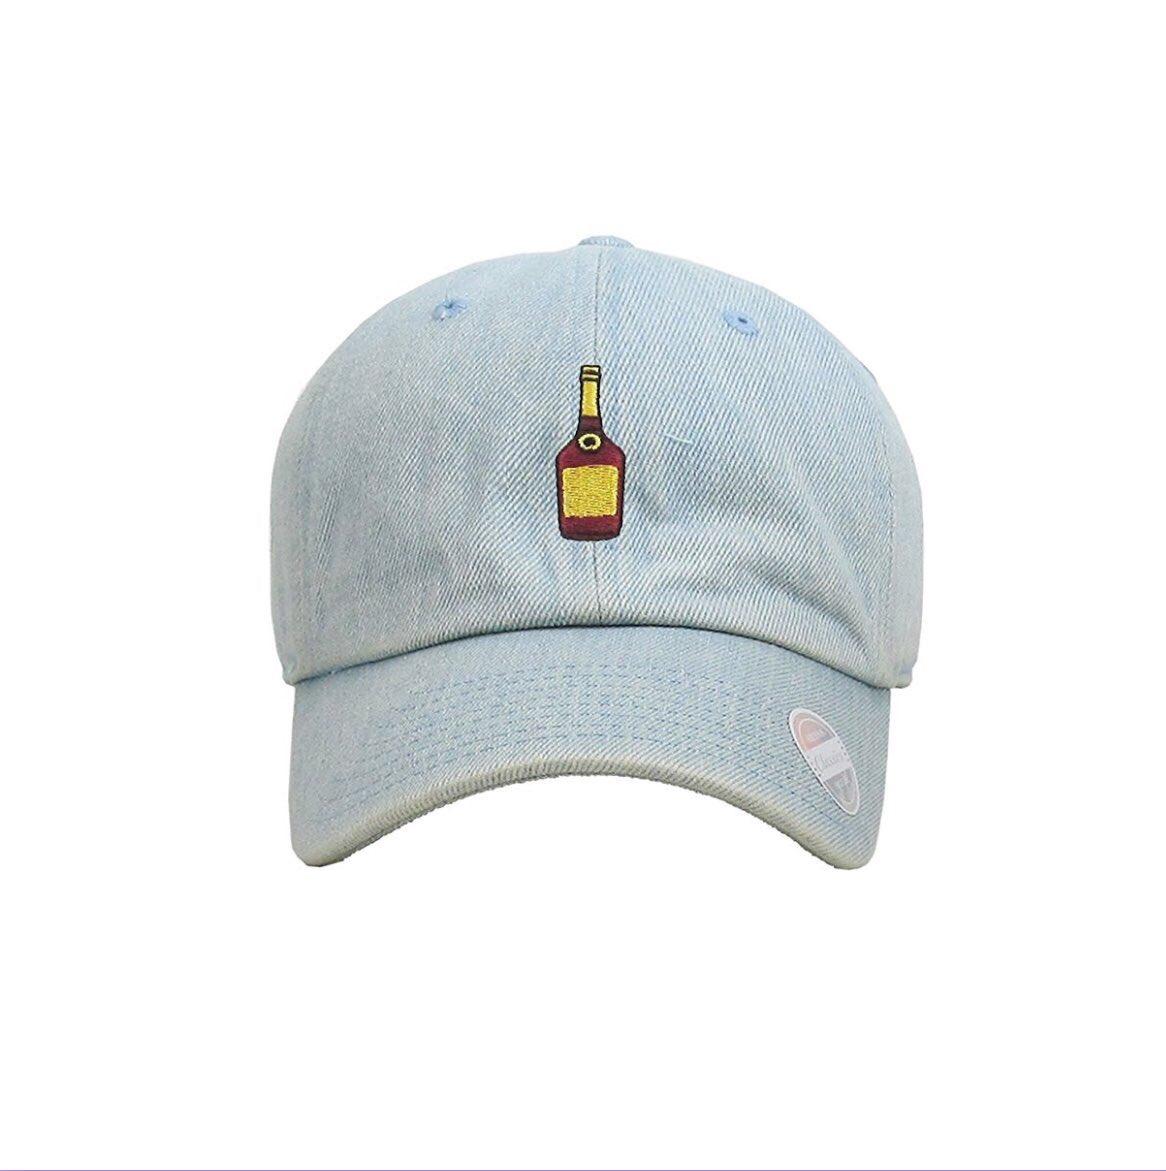 Henny Dad Hat 😍  Shop: https://t.co/Hx1W...